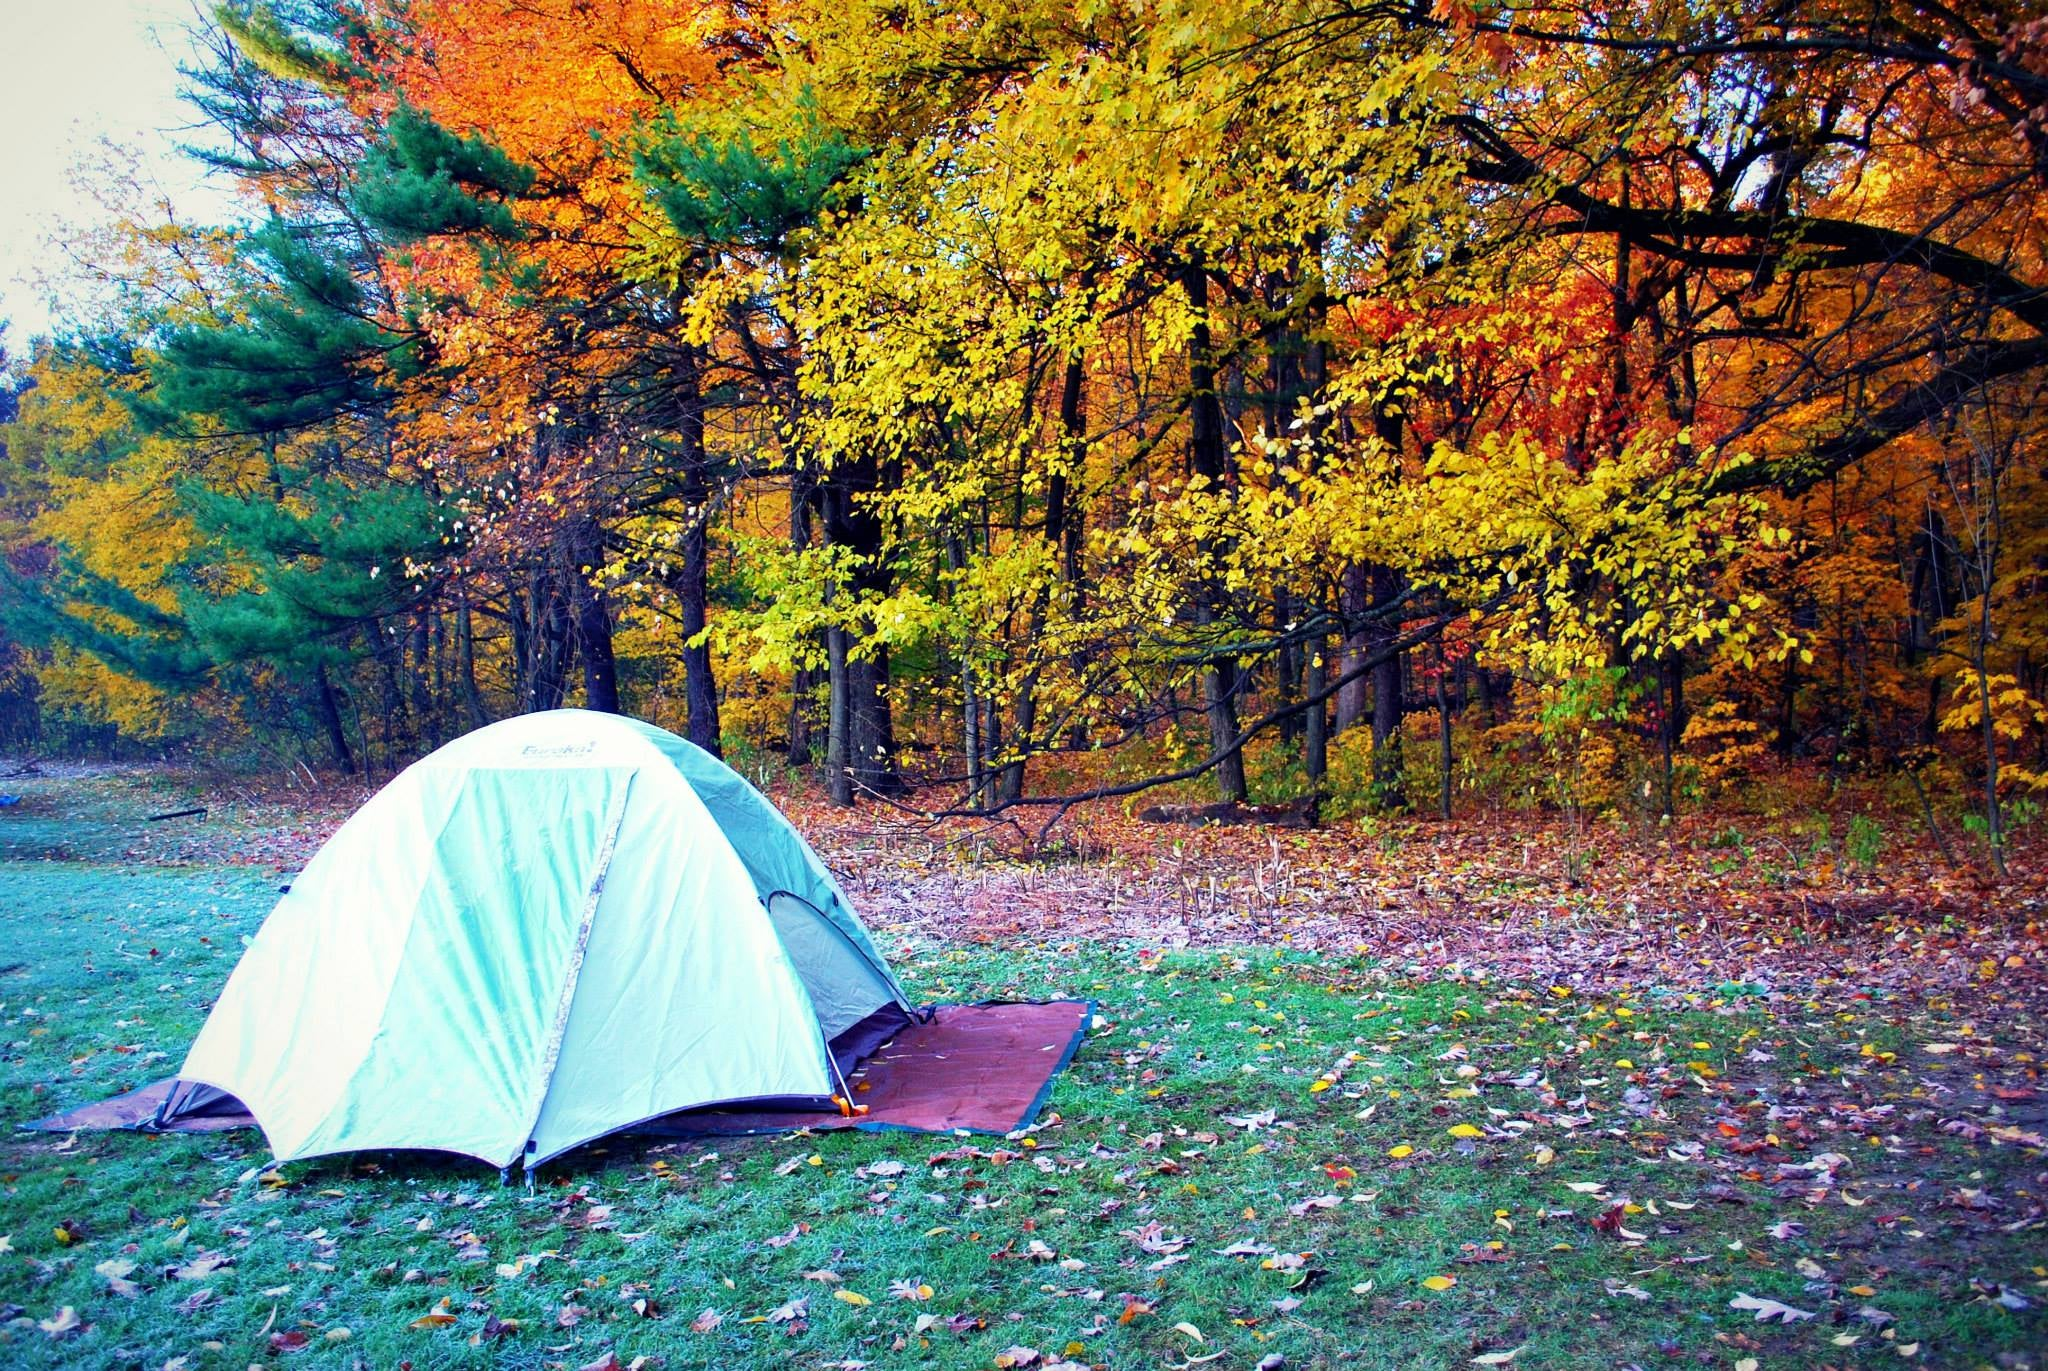 Camping in Winnebago Mission